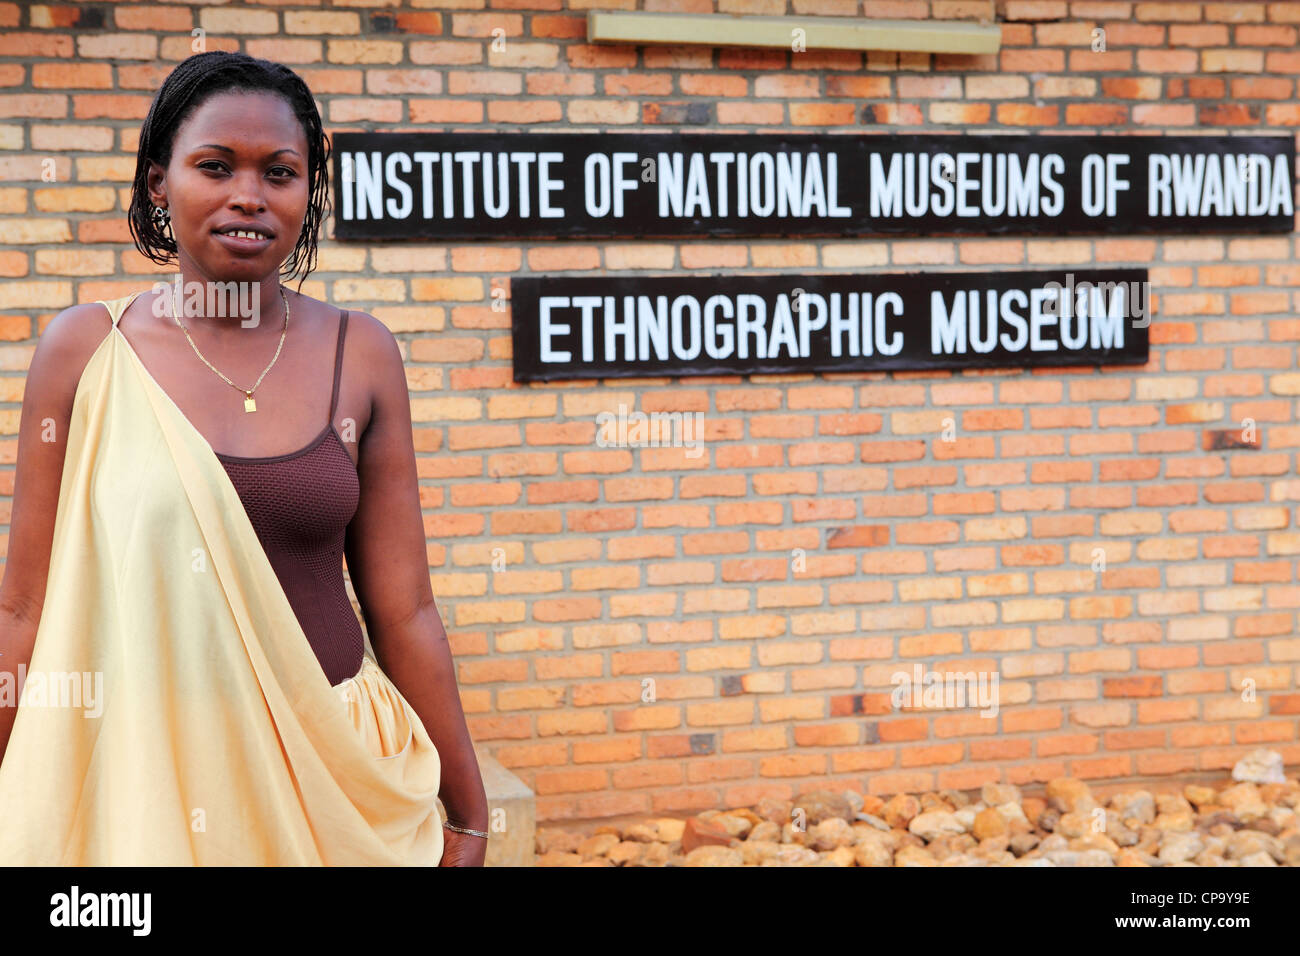 Female receptionist at the Ethnographic Museum in Huye, Rwanda. - Stock Image